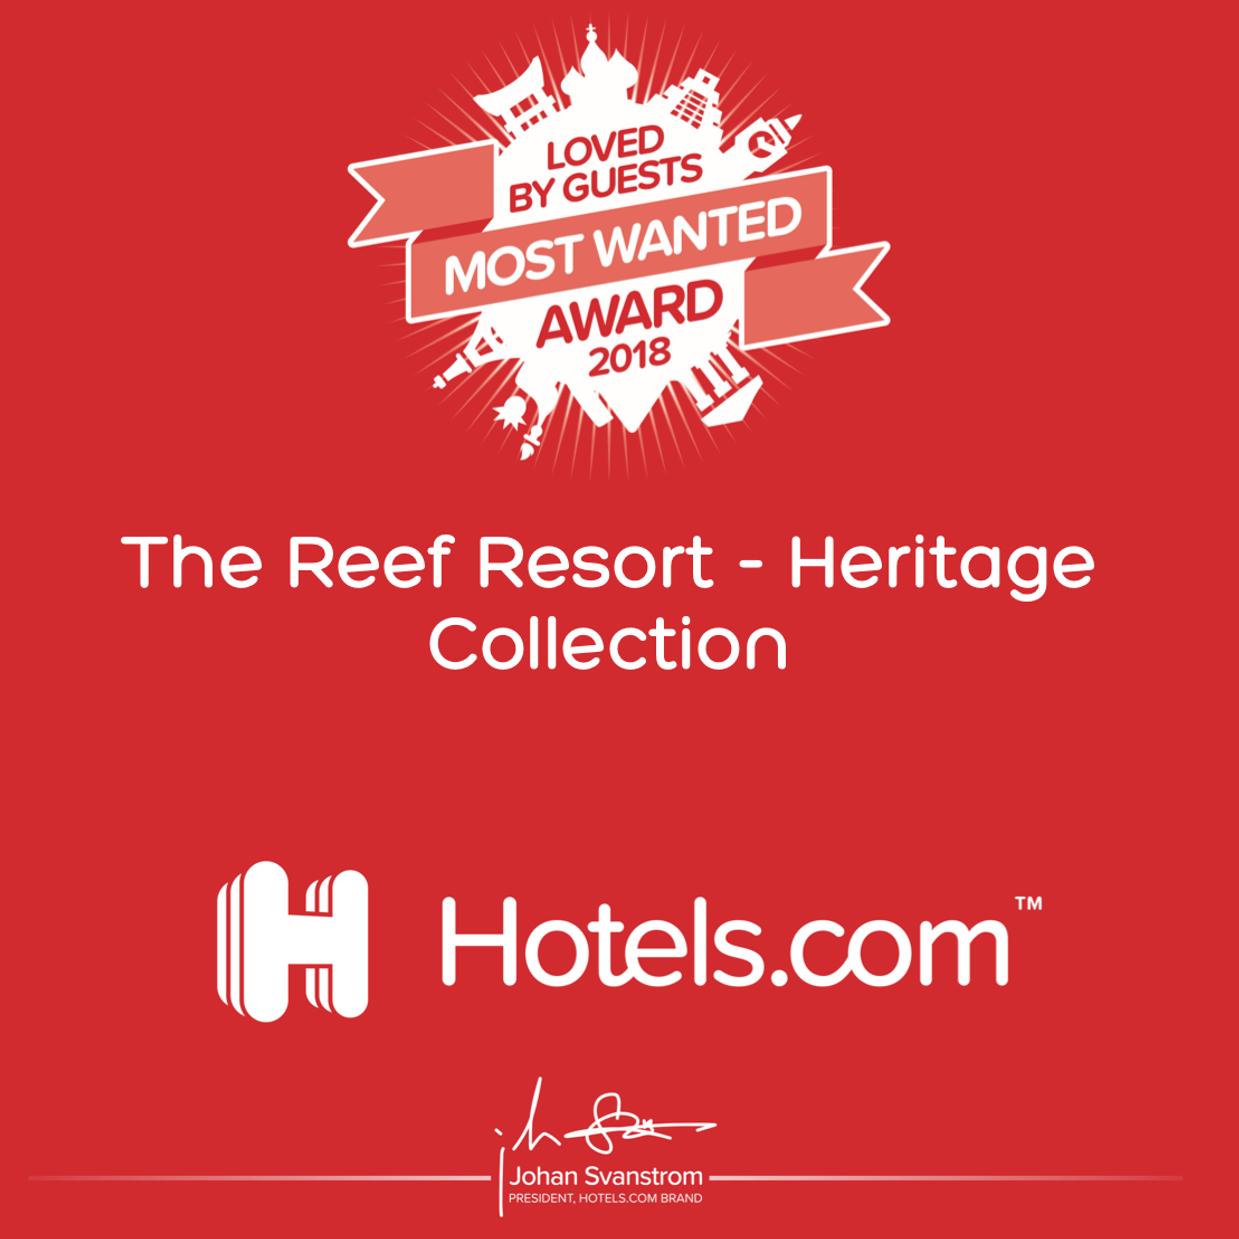 hotels.com most wanted award